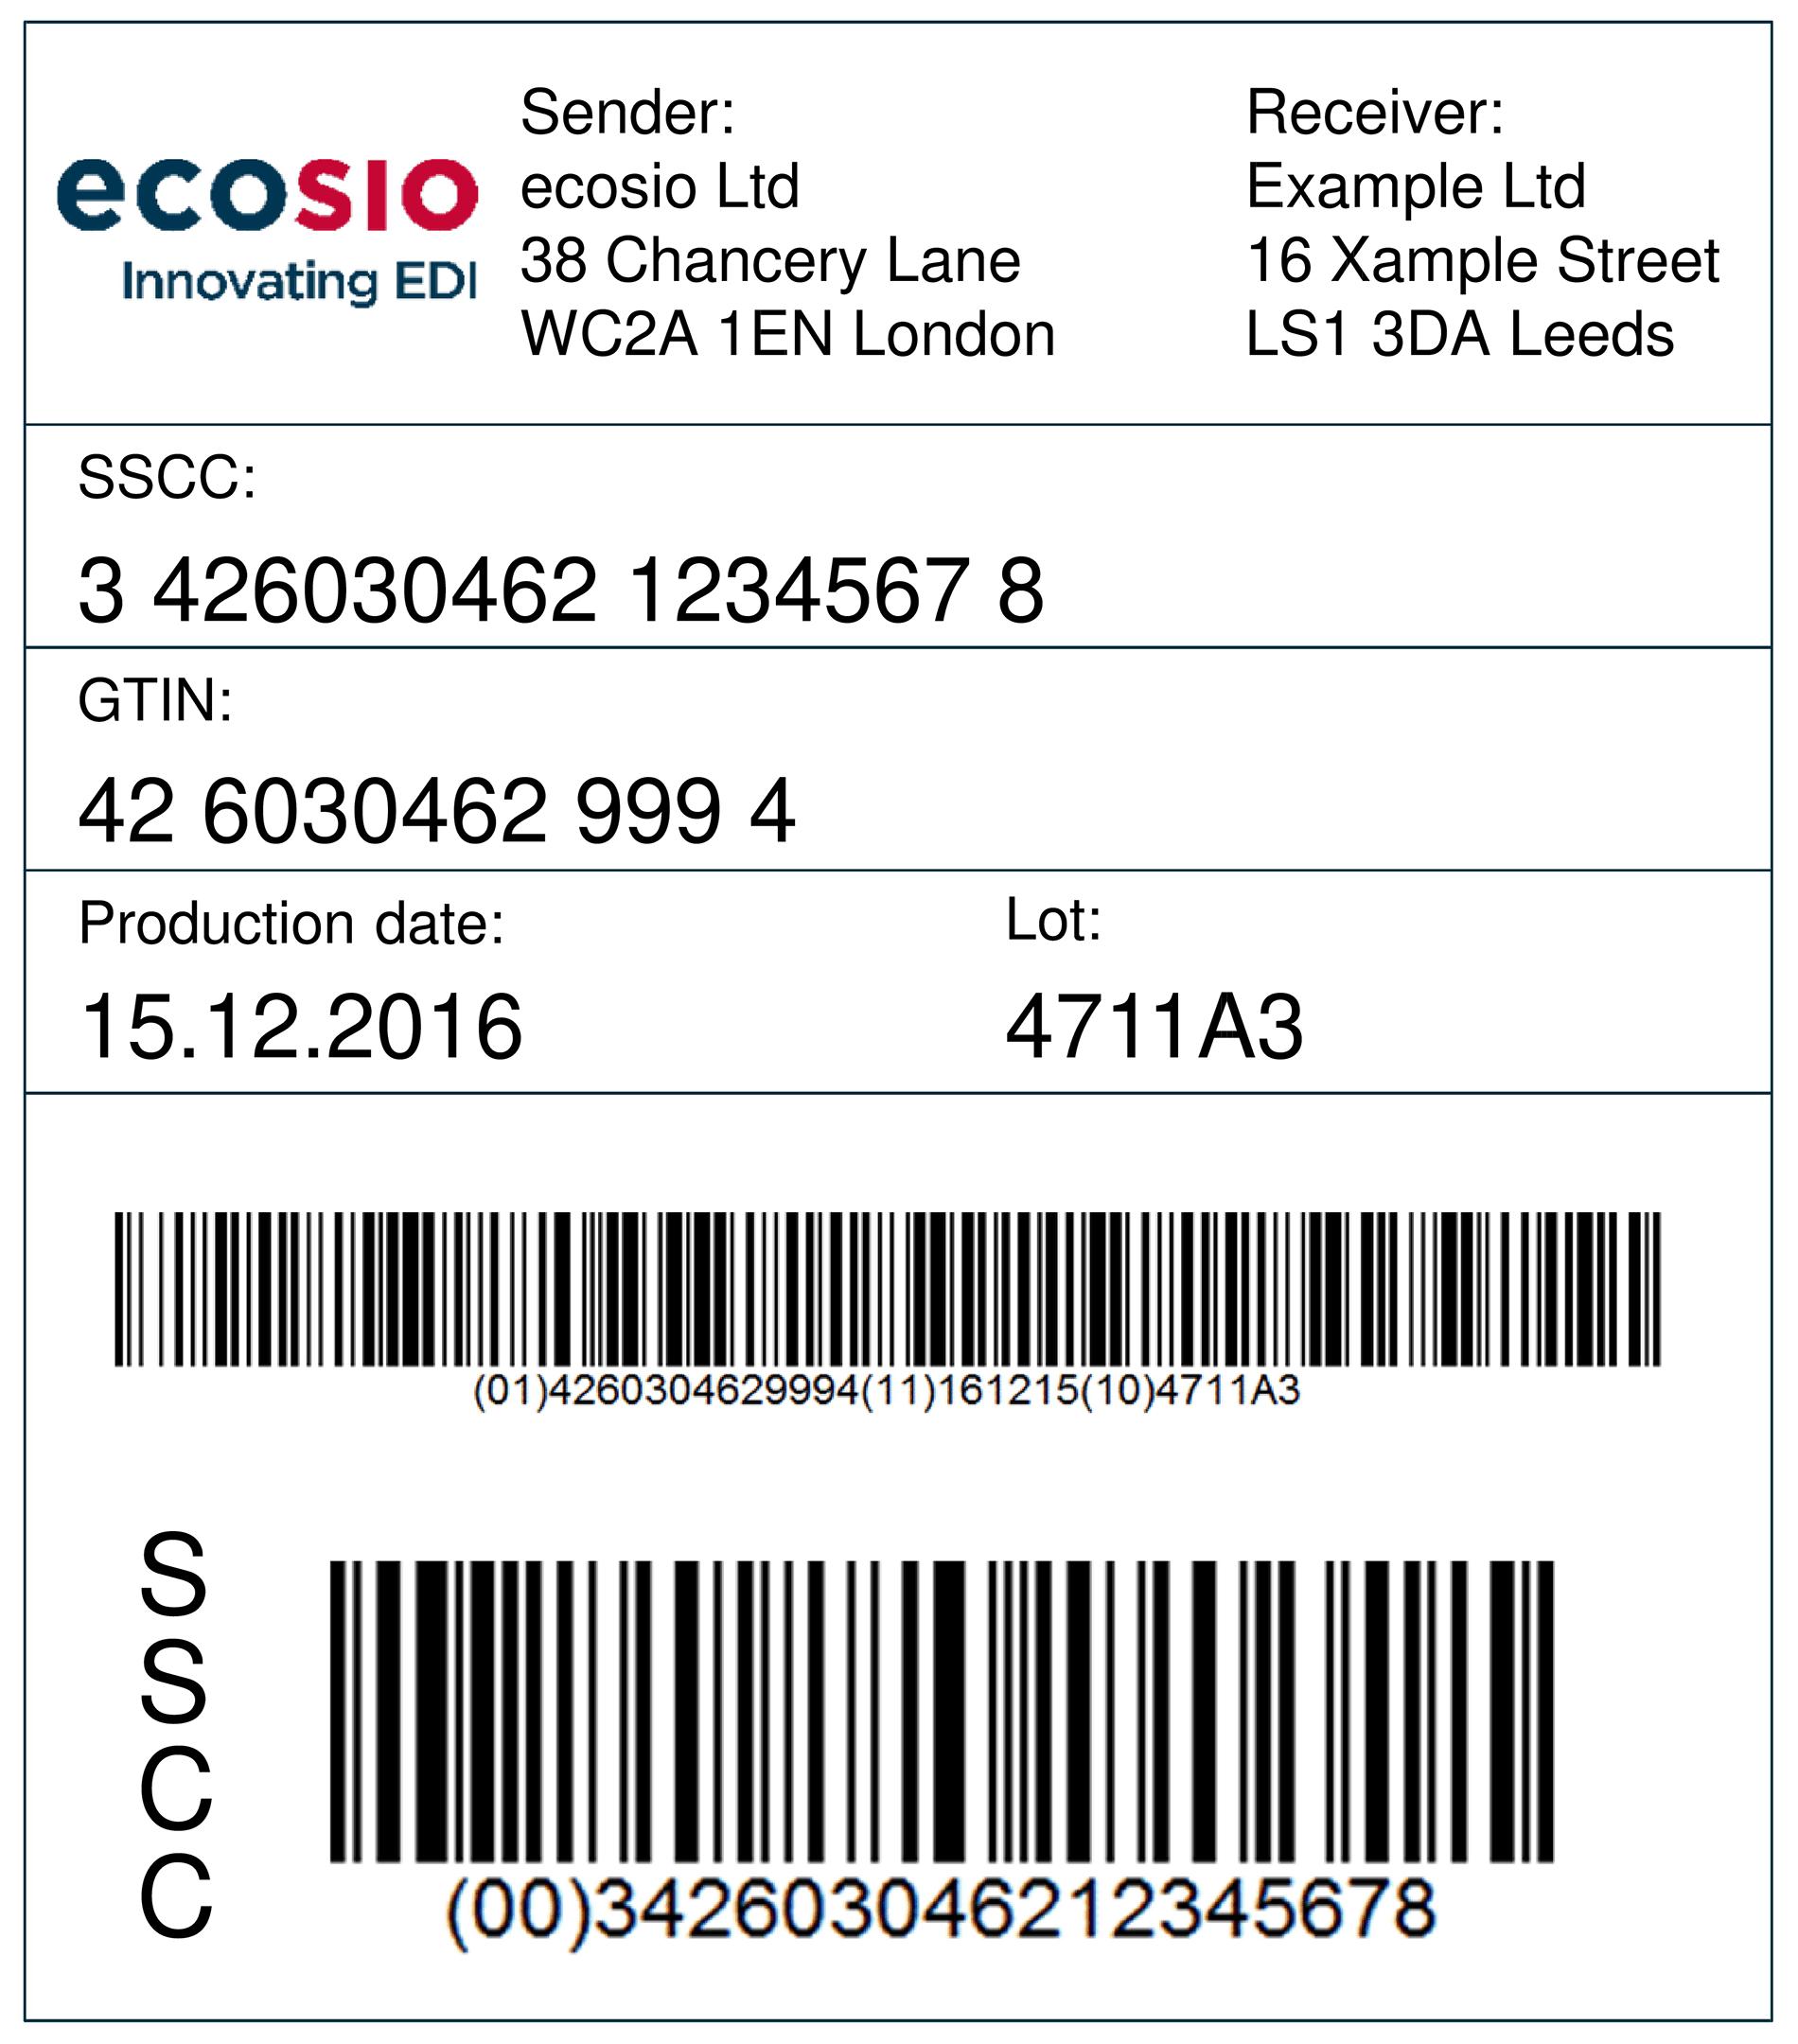 GS1 transport label